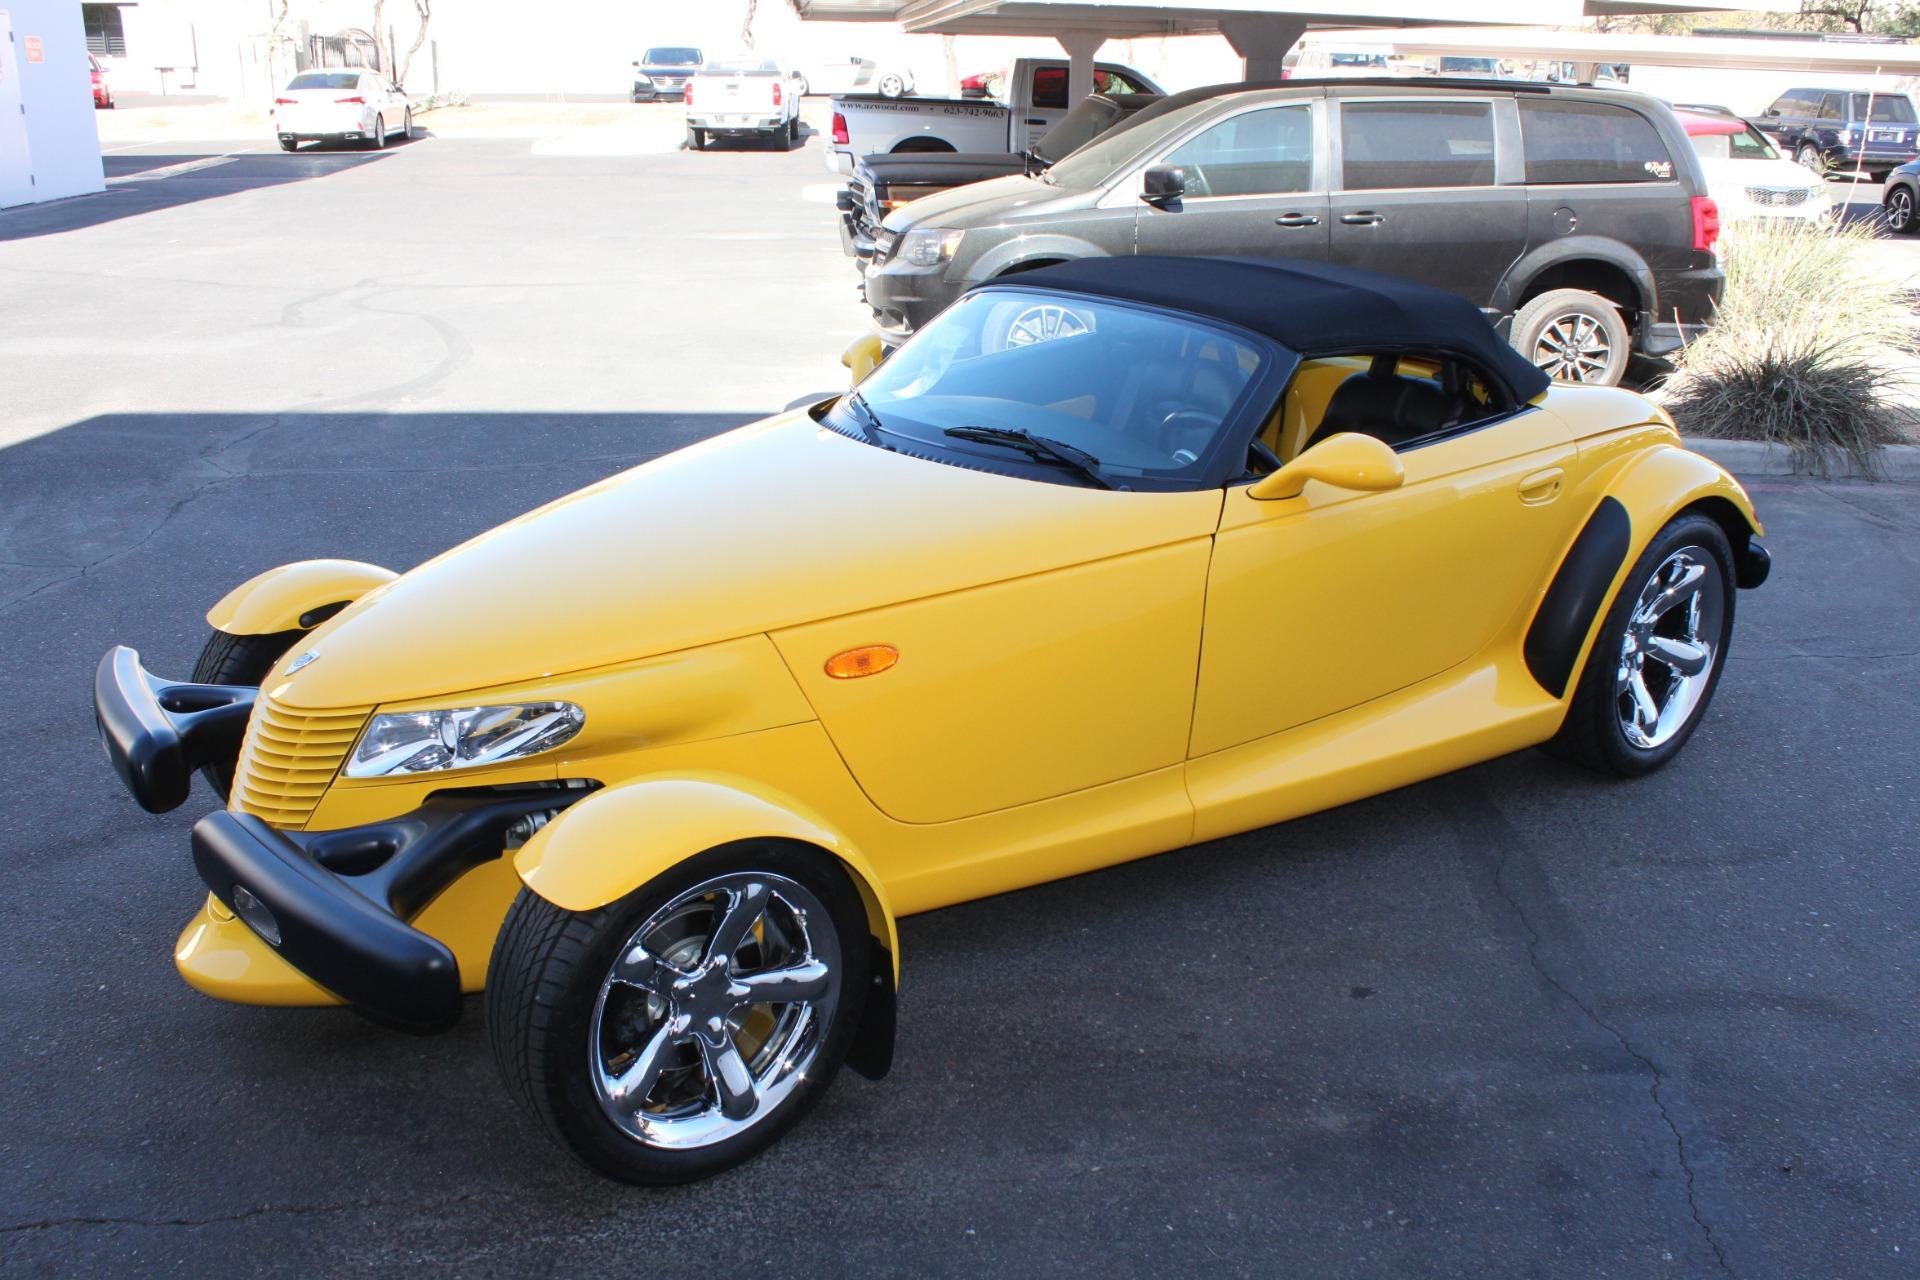 Used-2002-Chrysler-Prowler-Mini